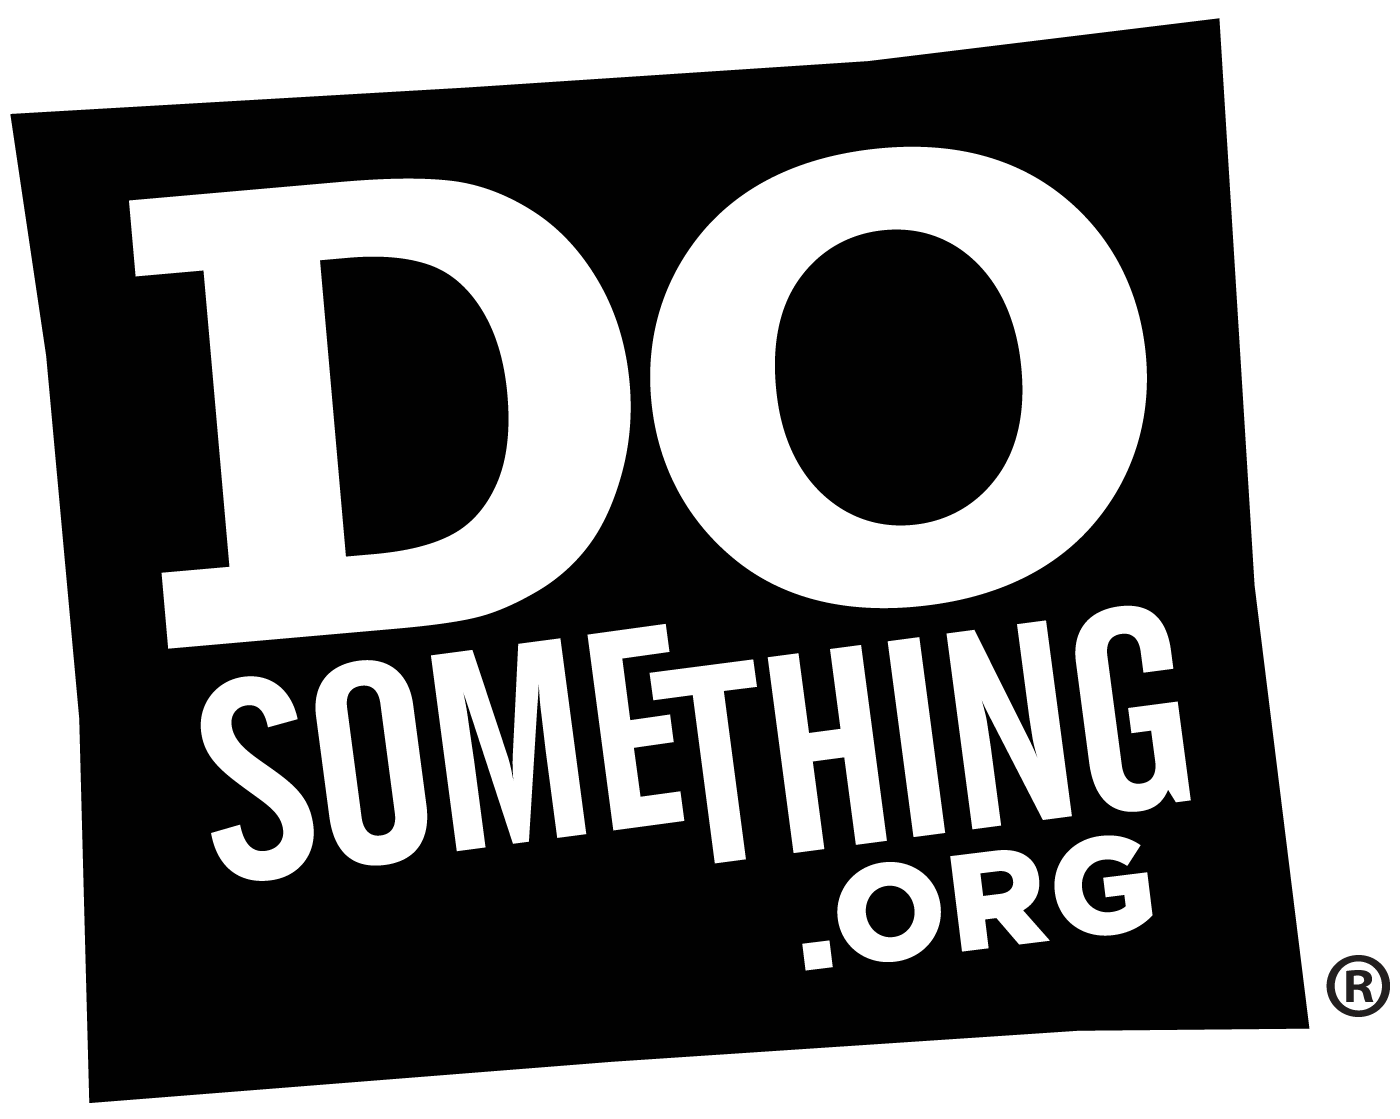 Community Service Organization - DoSomething.org  4